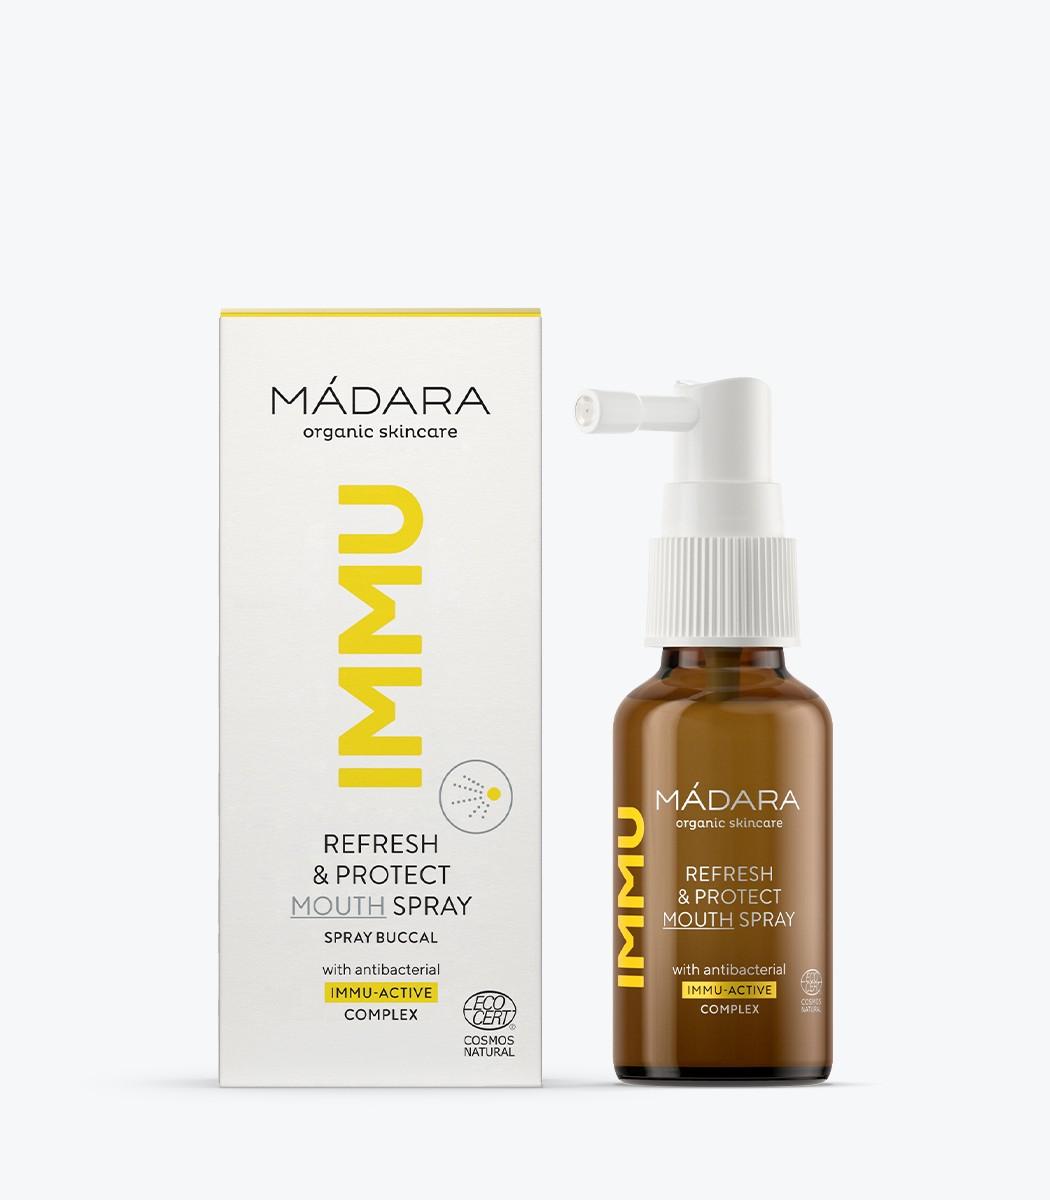 IMMU Refresh & Protect Mouth Spray, 30ml MADARA